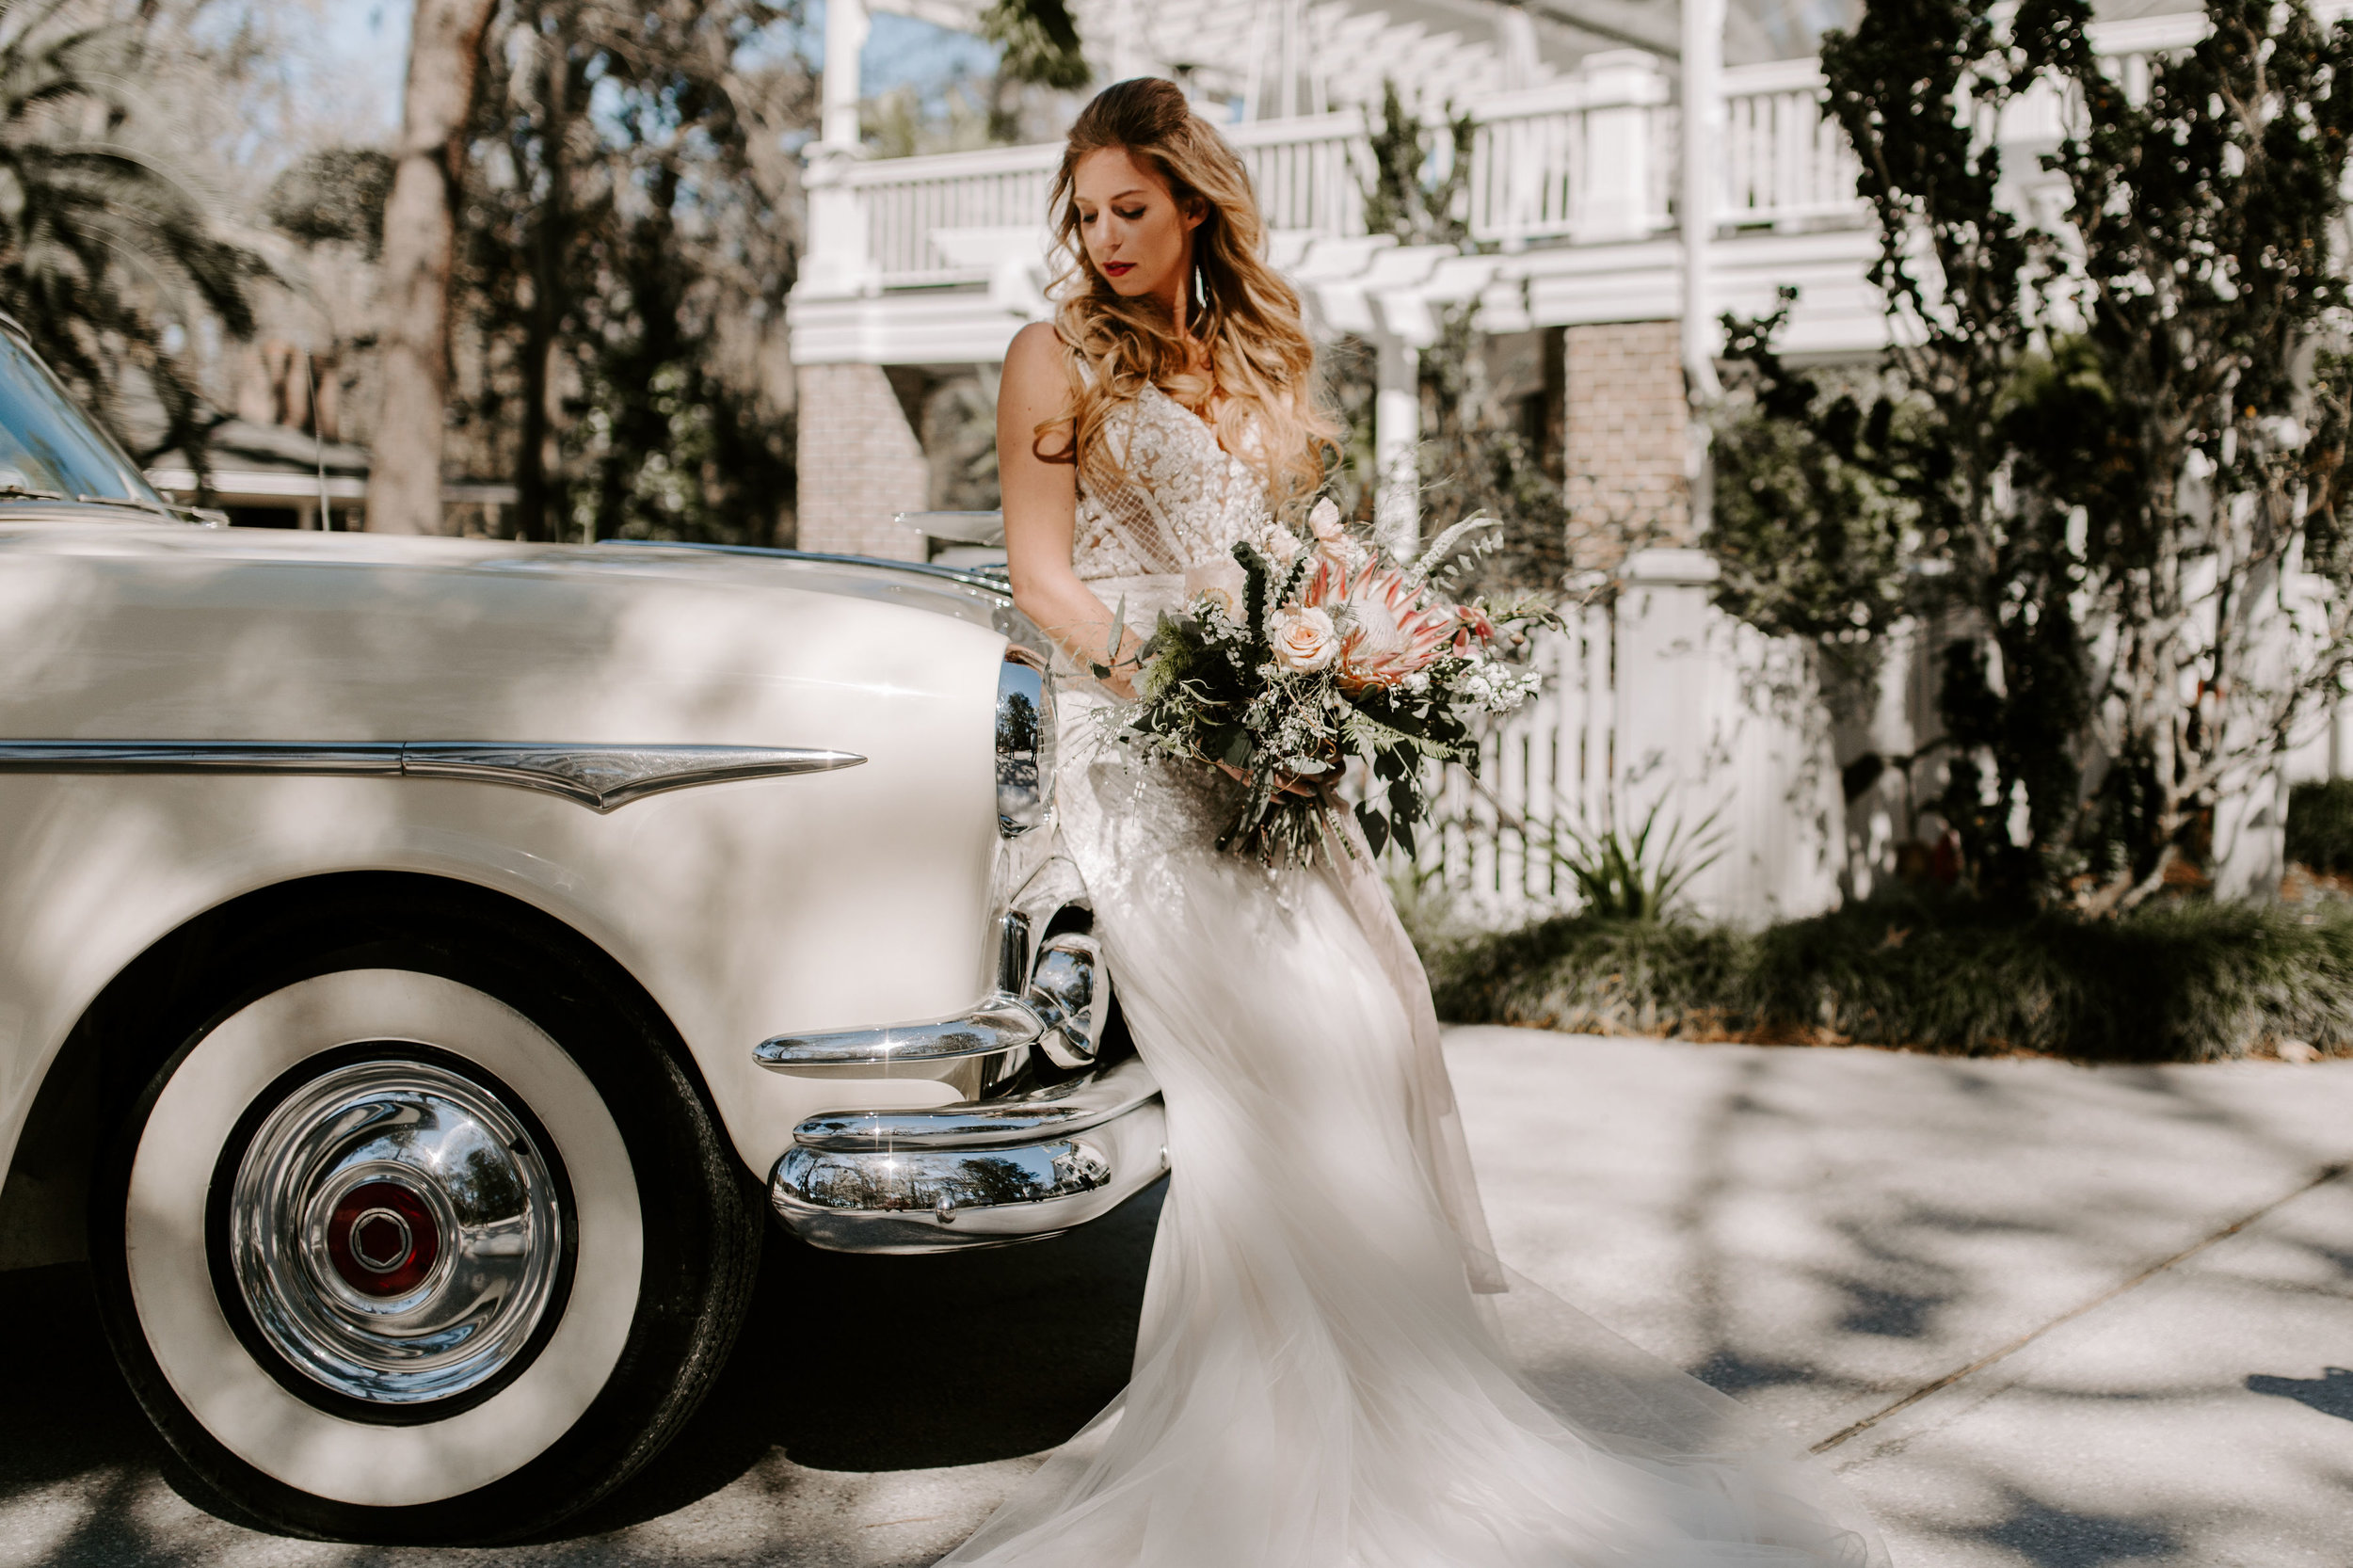 ivory-and-beau-blog-mackey-house-styled-shoot-savannah-wedding-bridal-boutique-savannah-florist-southern-wedding-_G5A1567.jpg